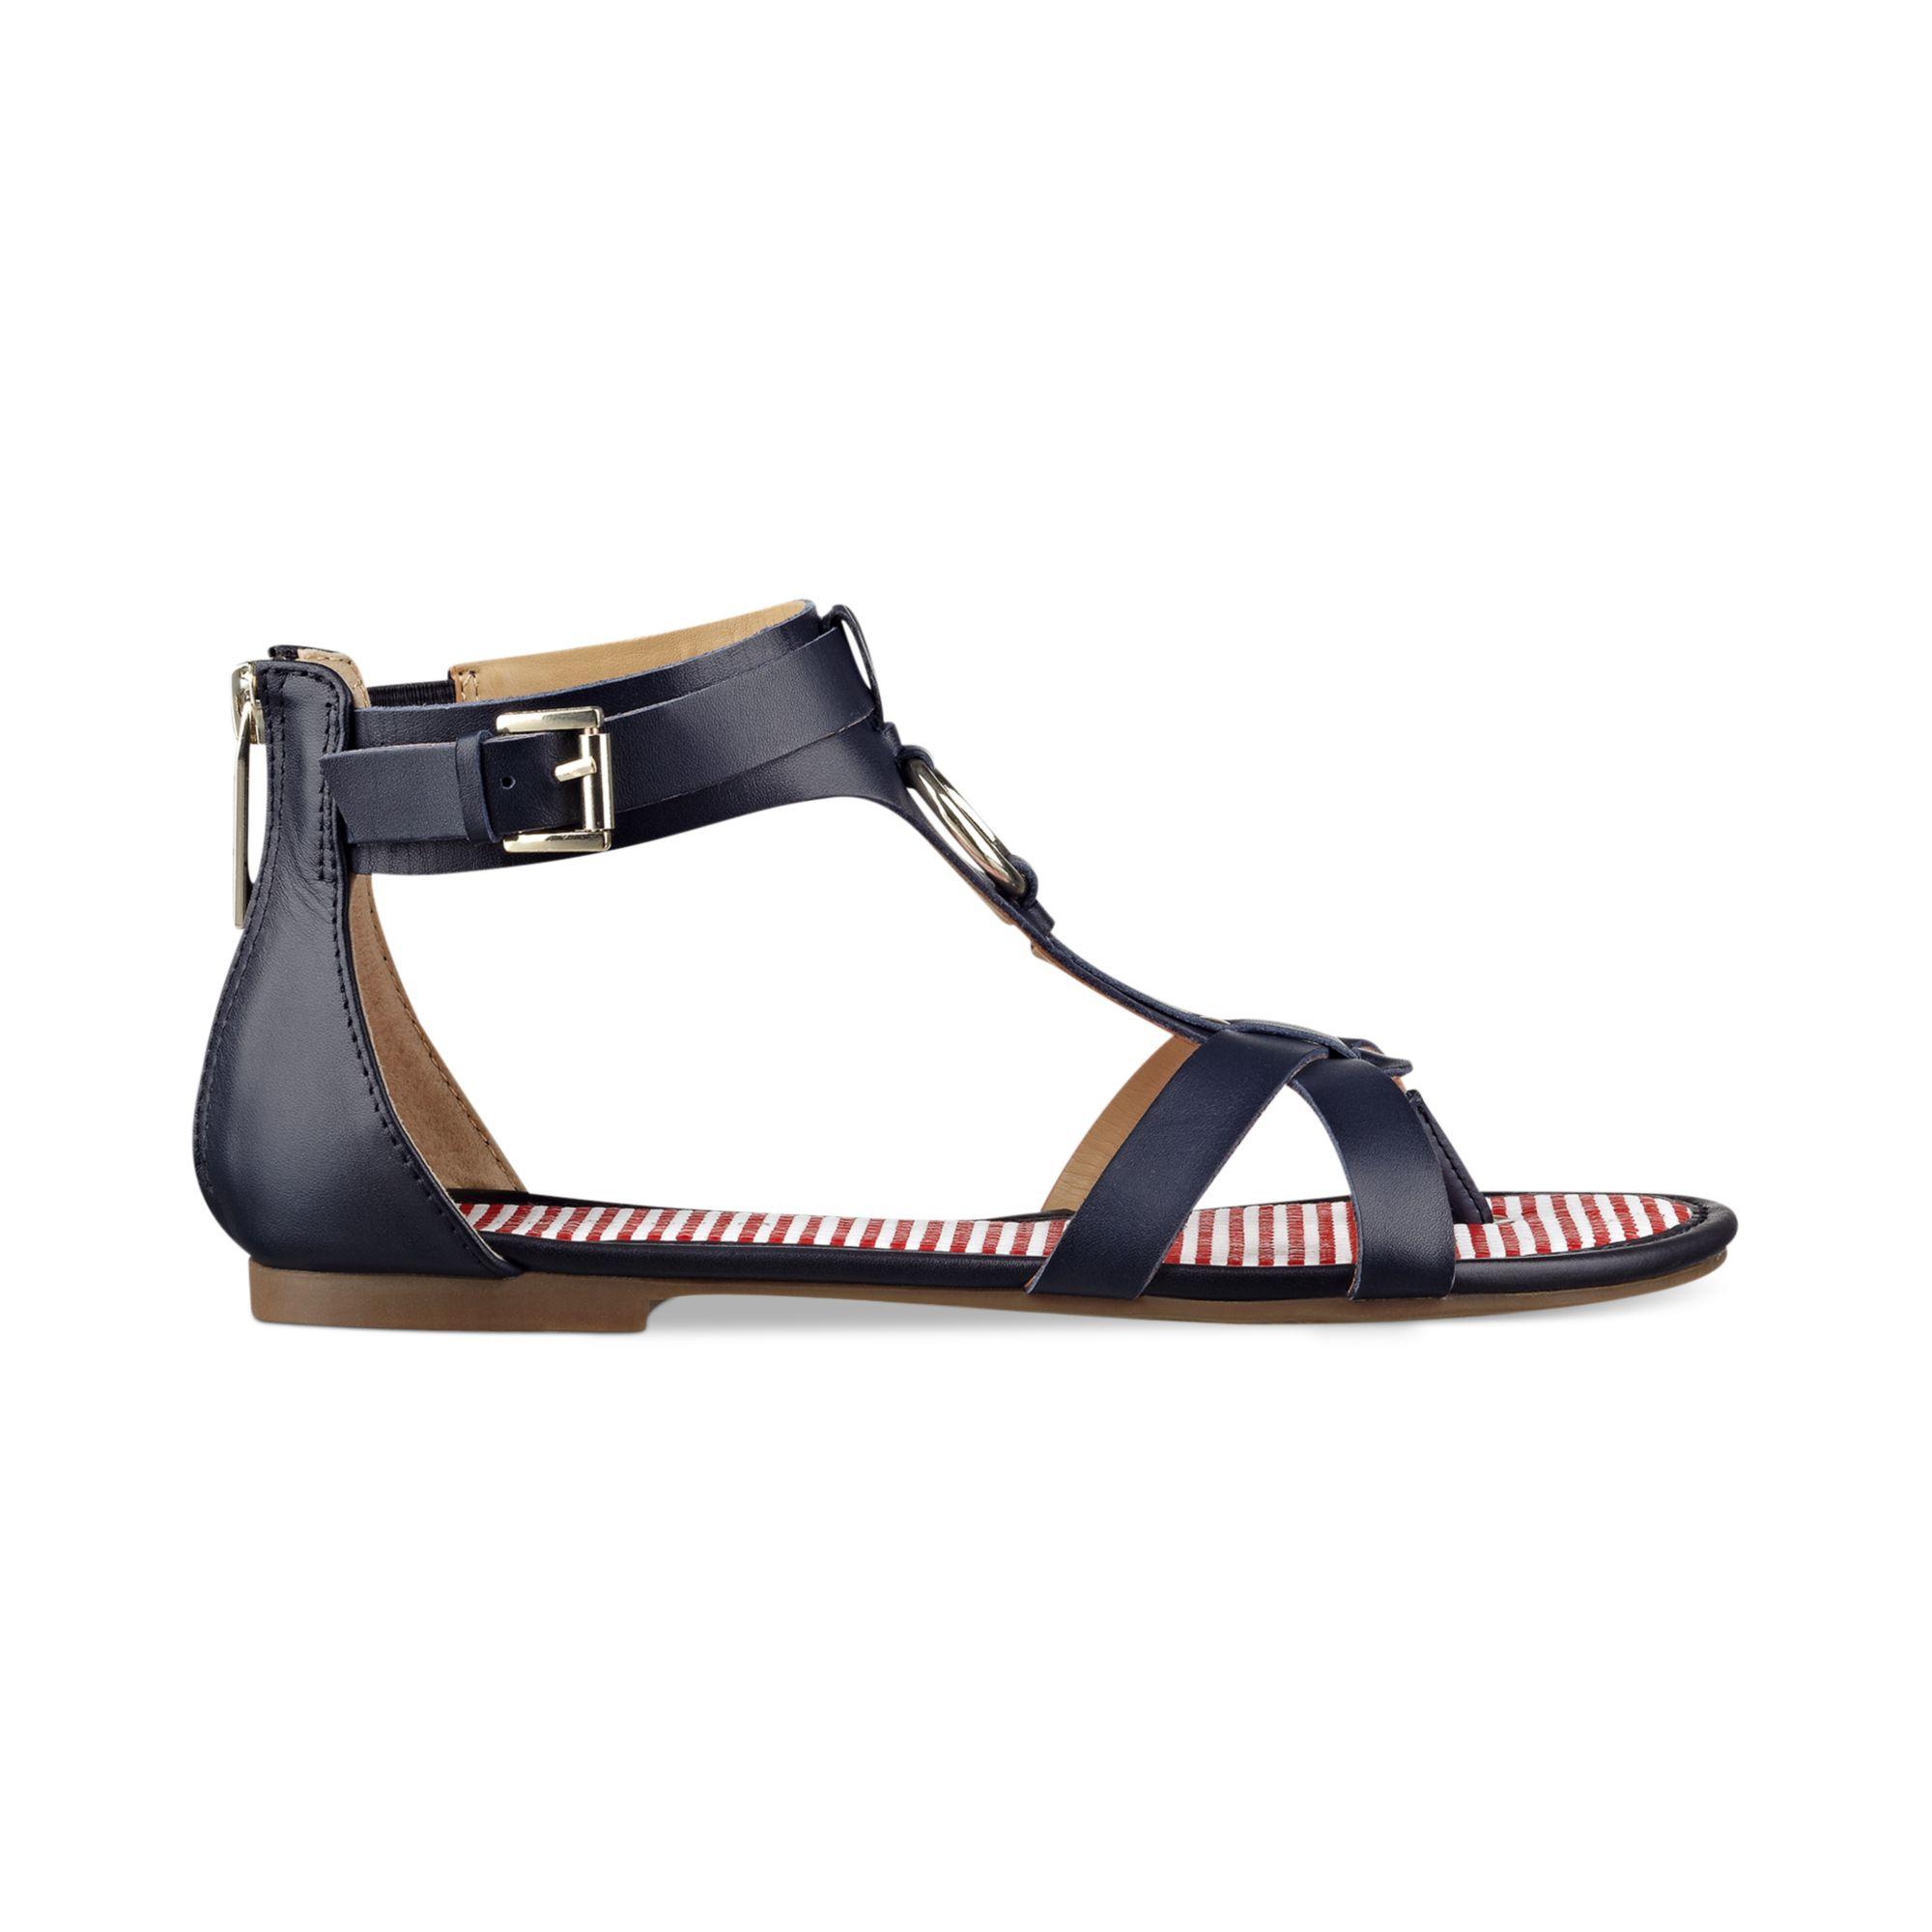 0cefbd54d55 Lyst - Tommy Hilfiger Shyla Gladiator Thong Sandals in Blue